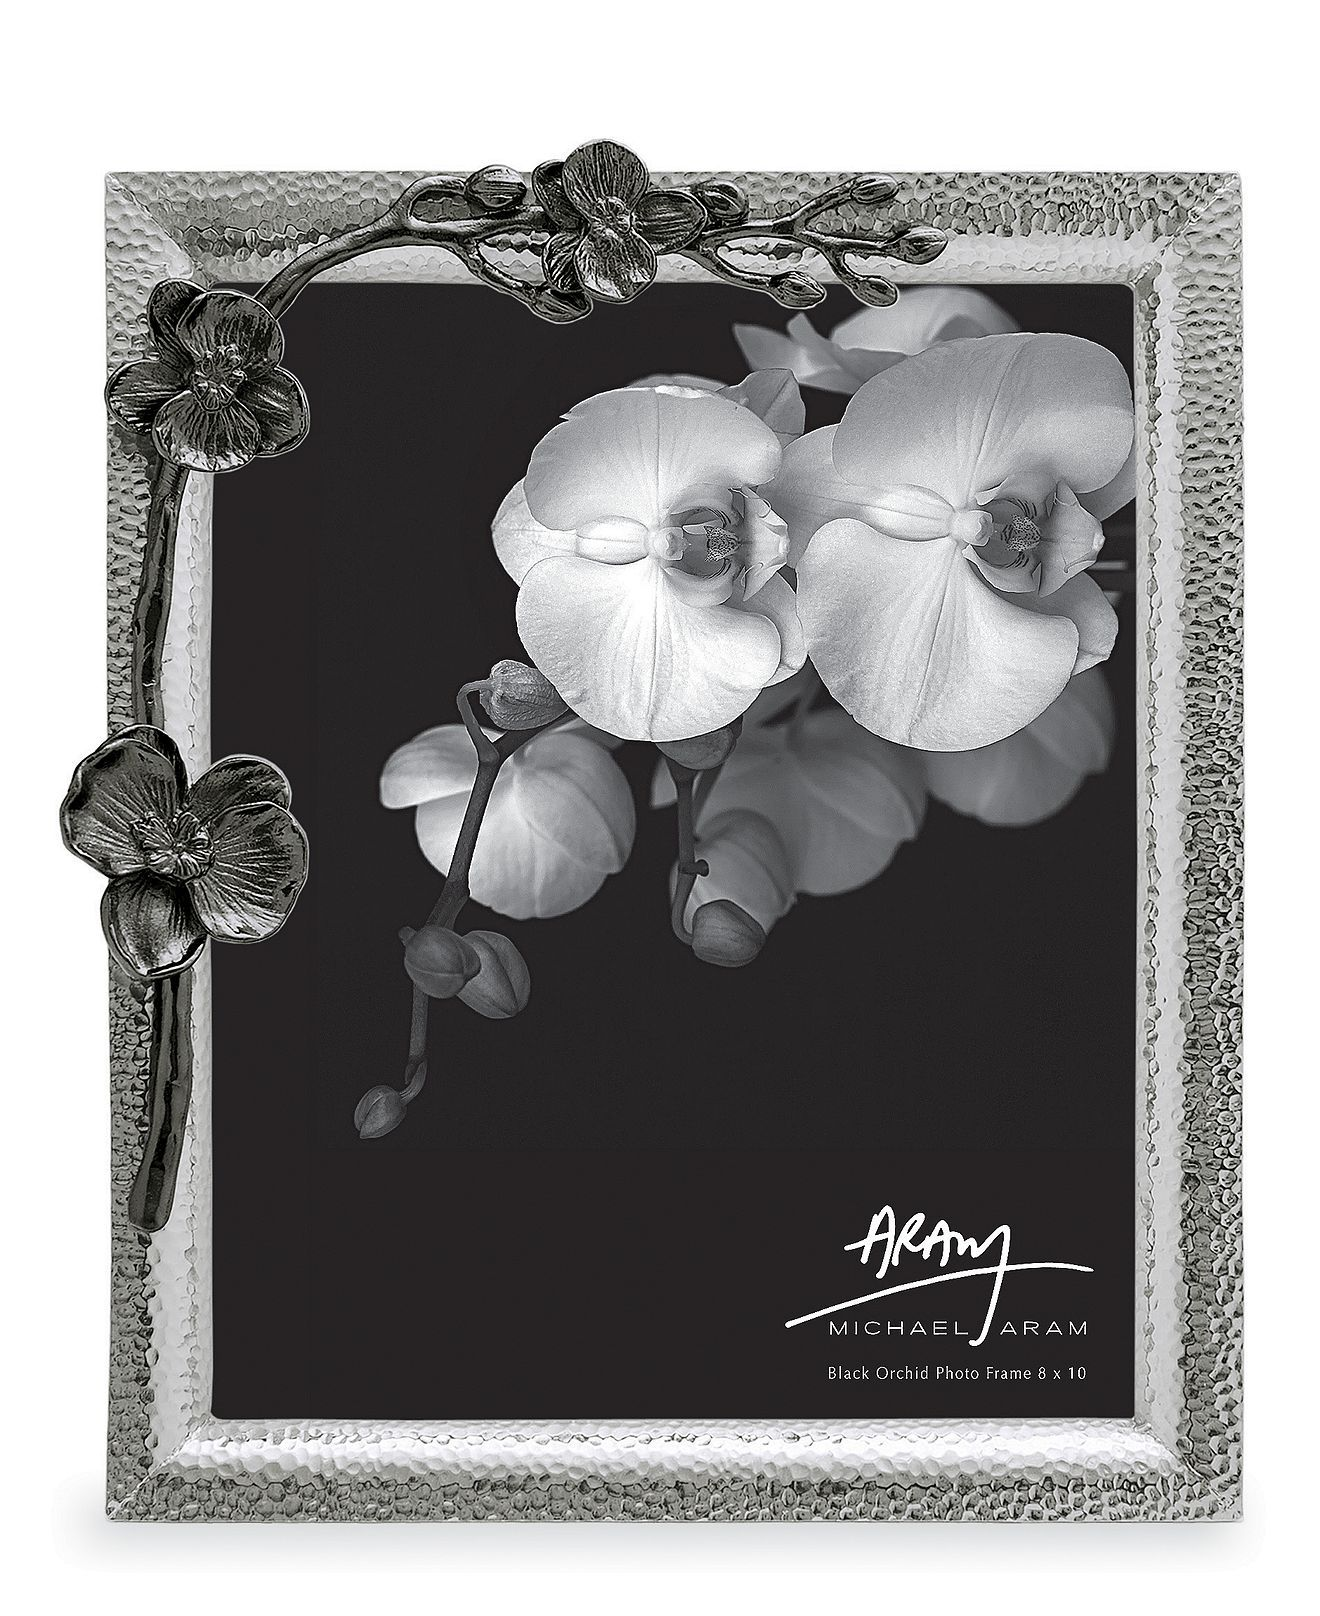 Black Orchid 8 x 10 Picture Frame   Pinterest